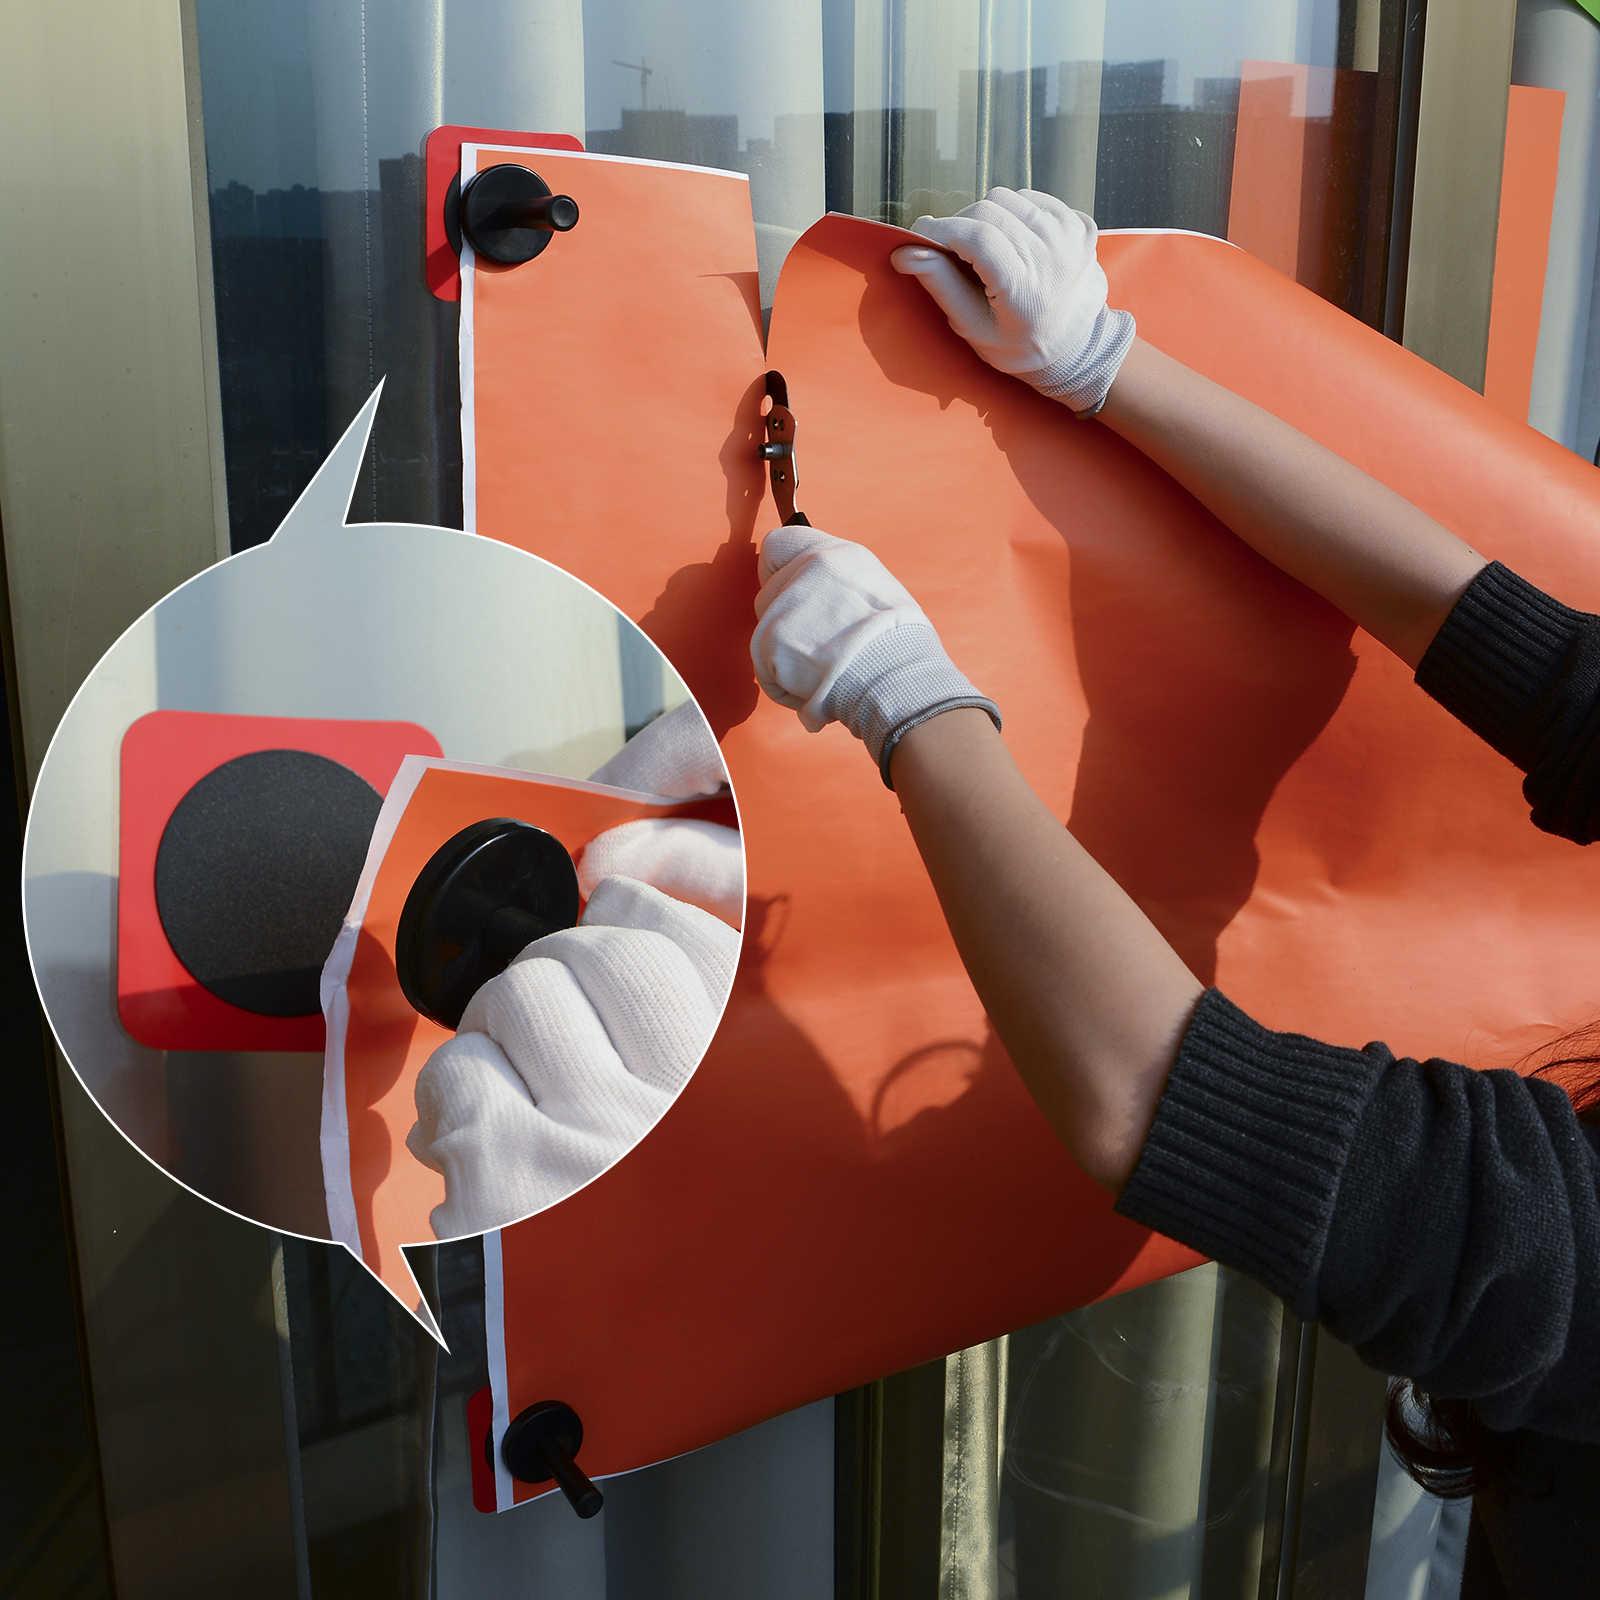 EHDIS ויניל לעטוף רכב חזק גריפר מגנט סדר בעל + סיליקון מתכת ספיחה תיקון גיליון פחמן סרט מדבקת תיקון כלי